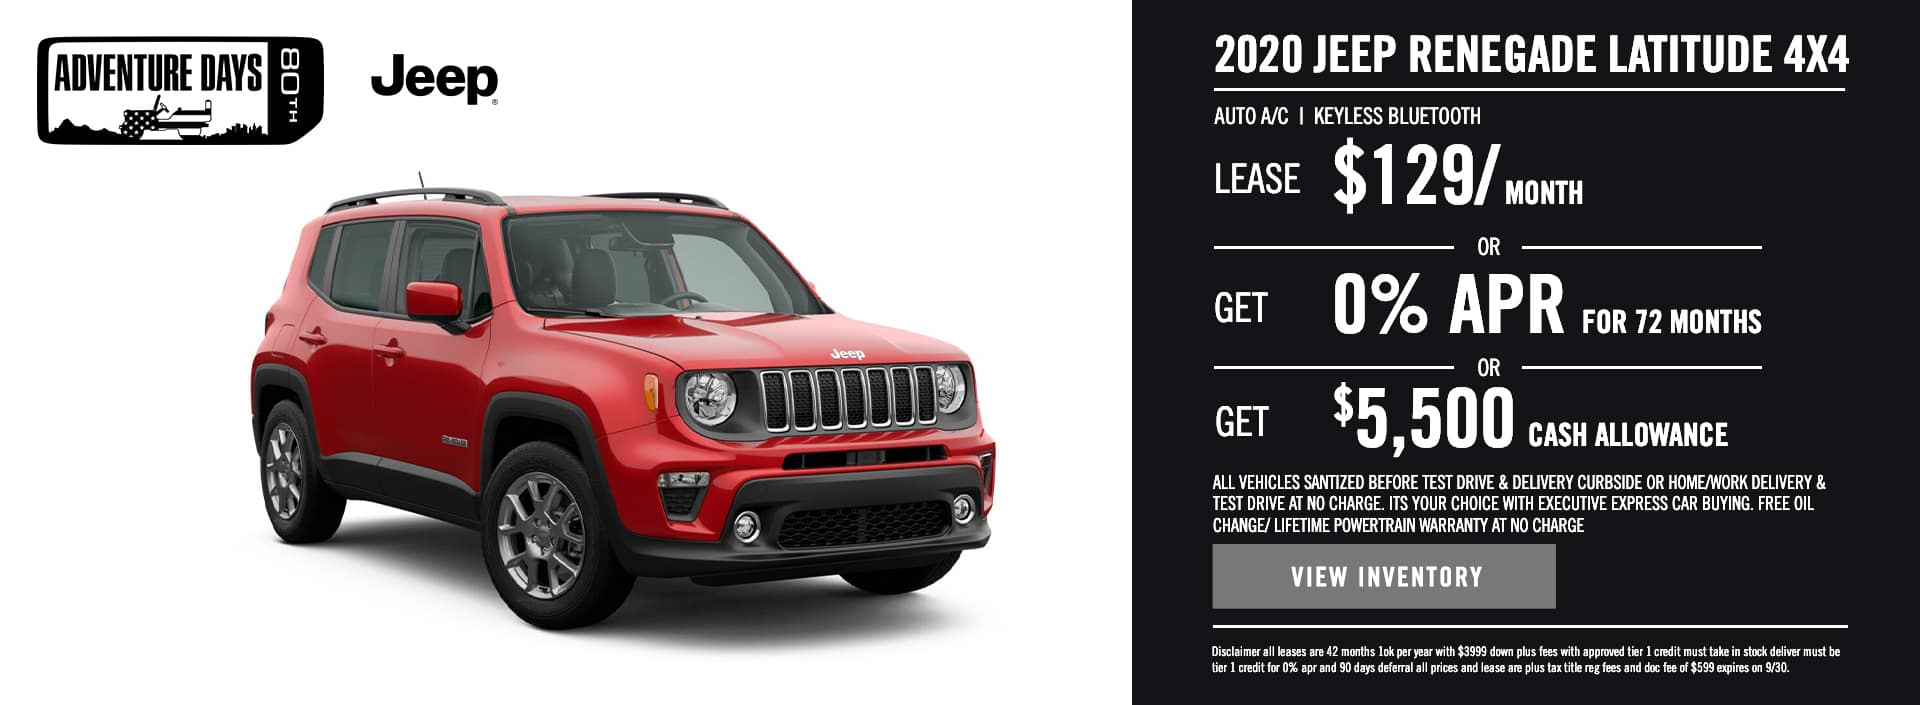 EAG_Jeep_2020 Jeep Renegade Latitude 4×4 (1)